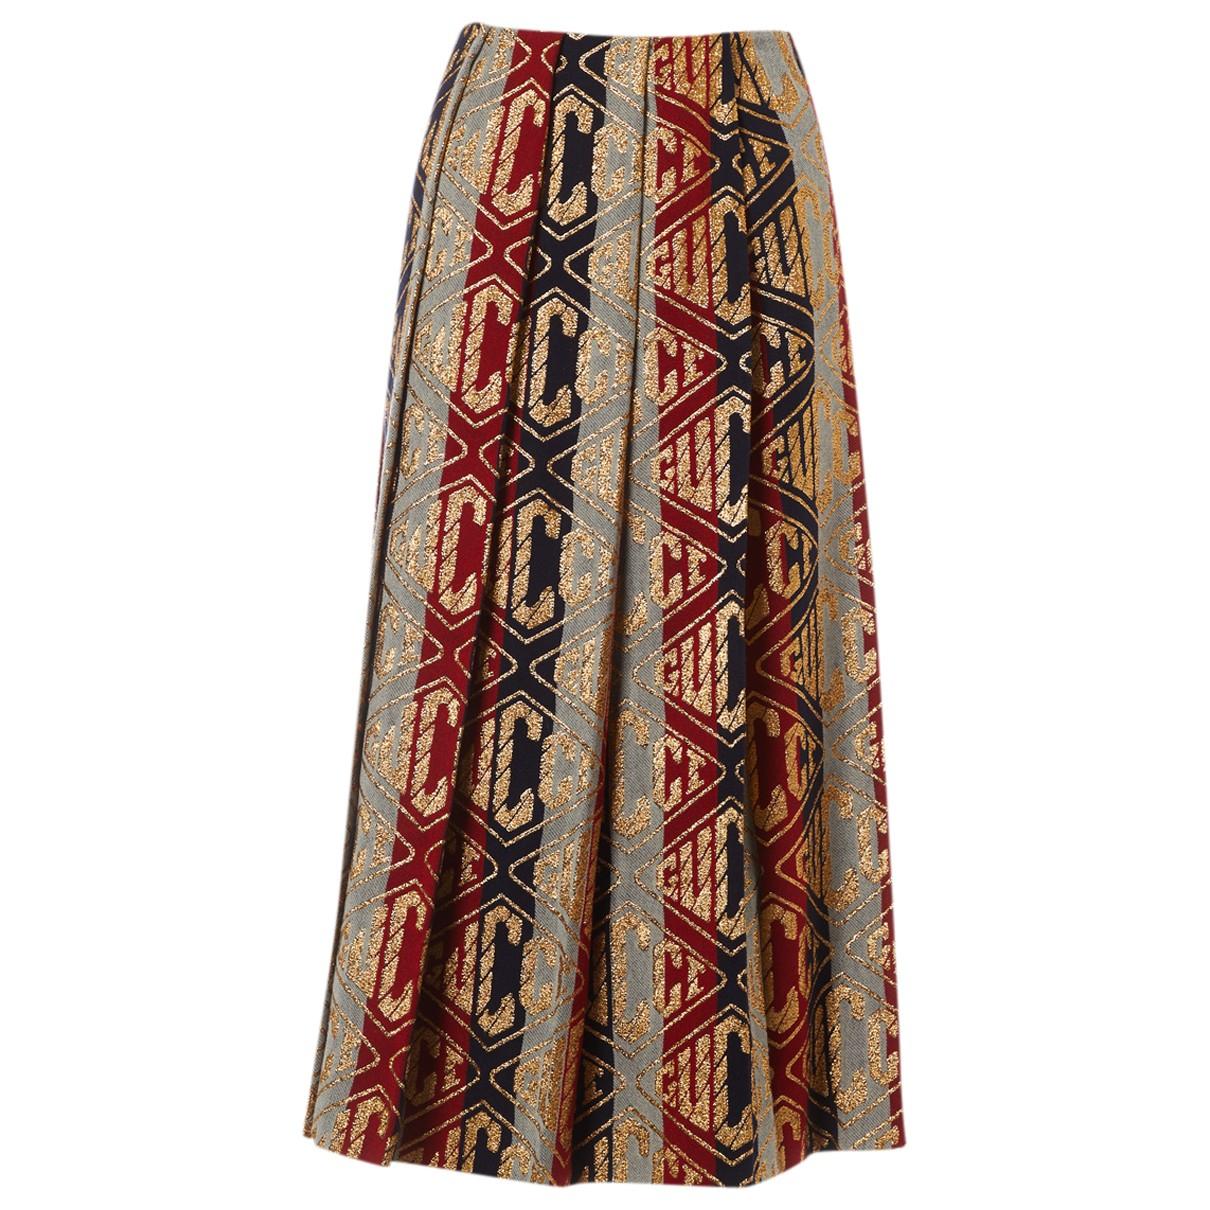 Gucci \N Multicolour Wool skirt for Women 38 IT